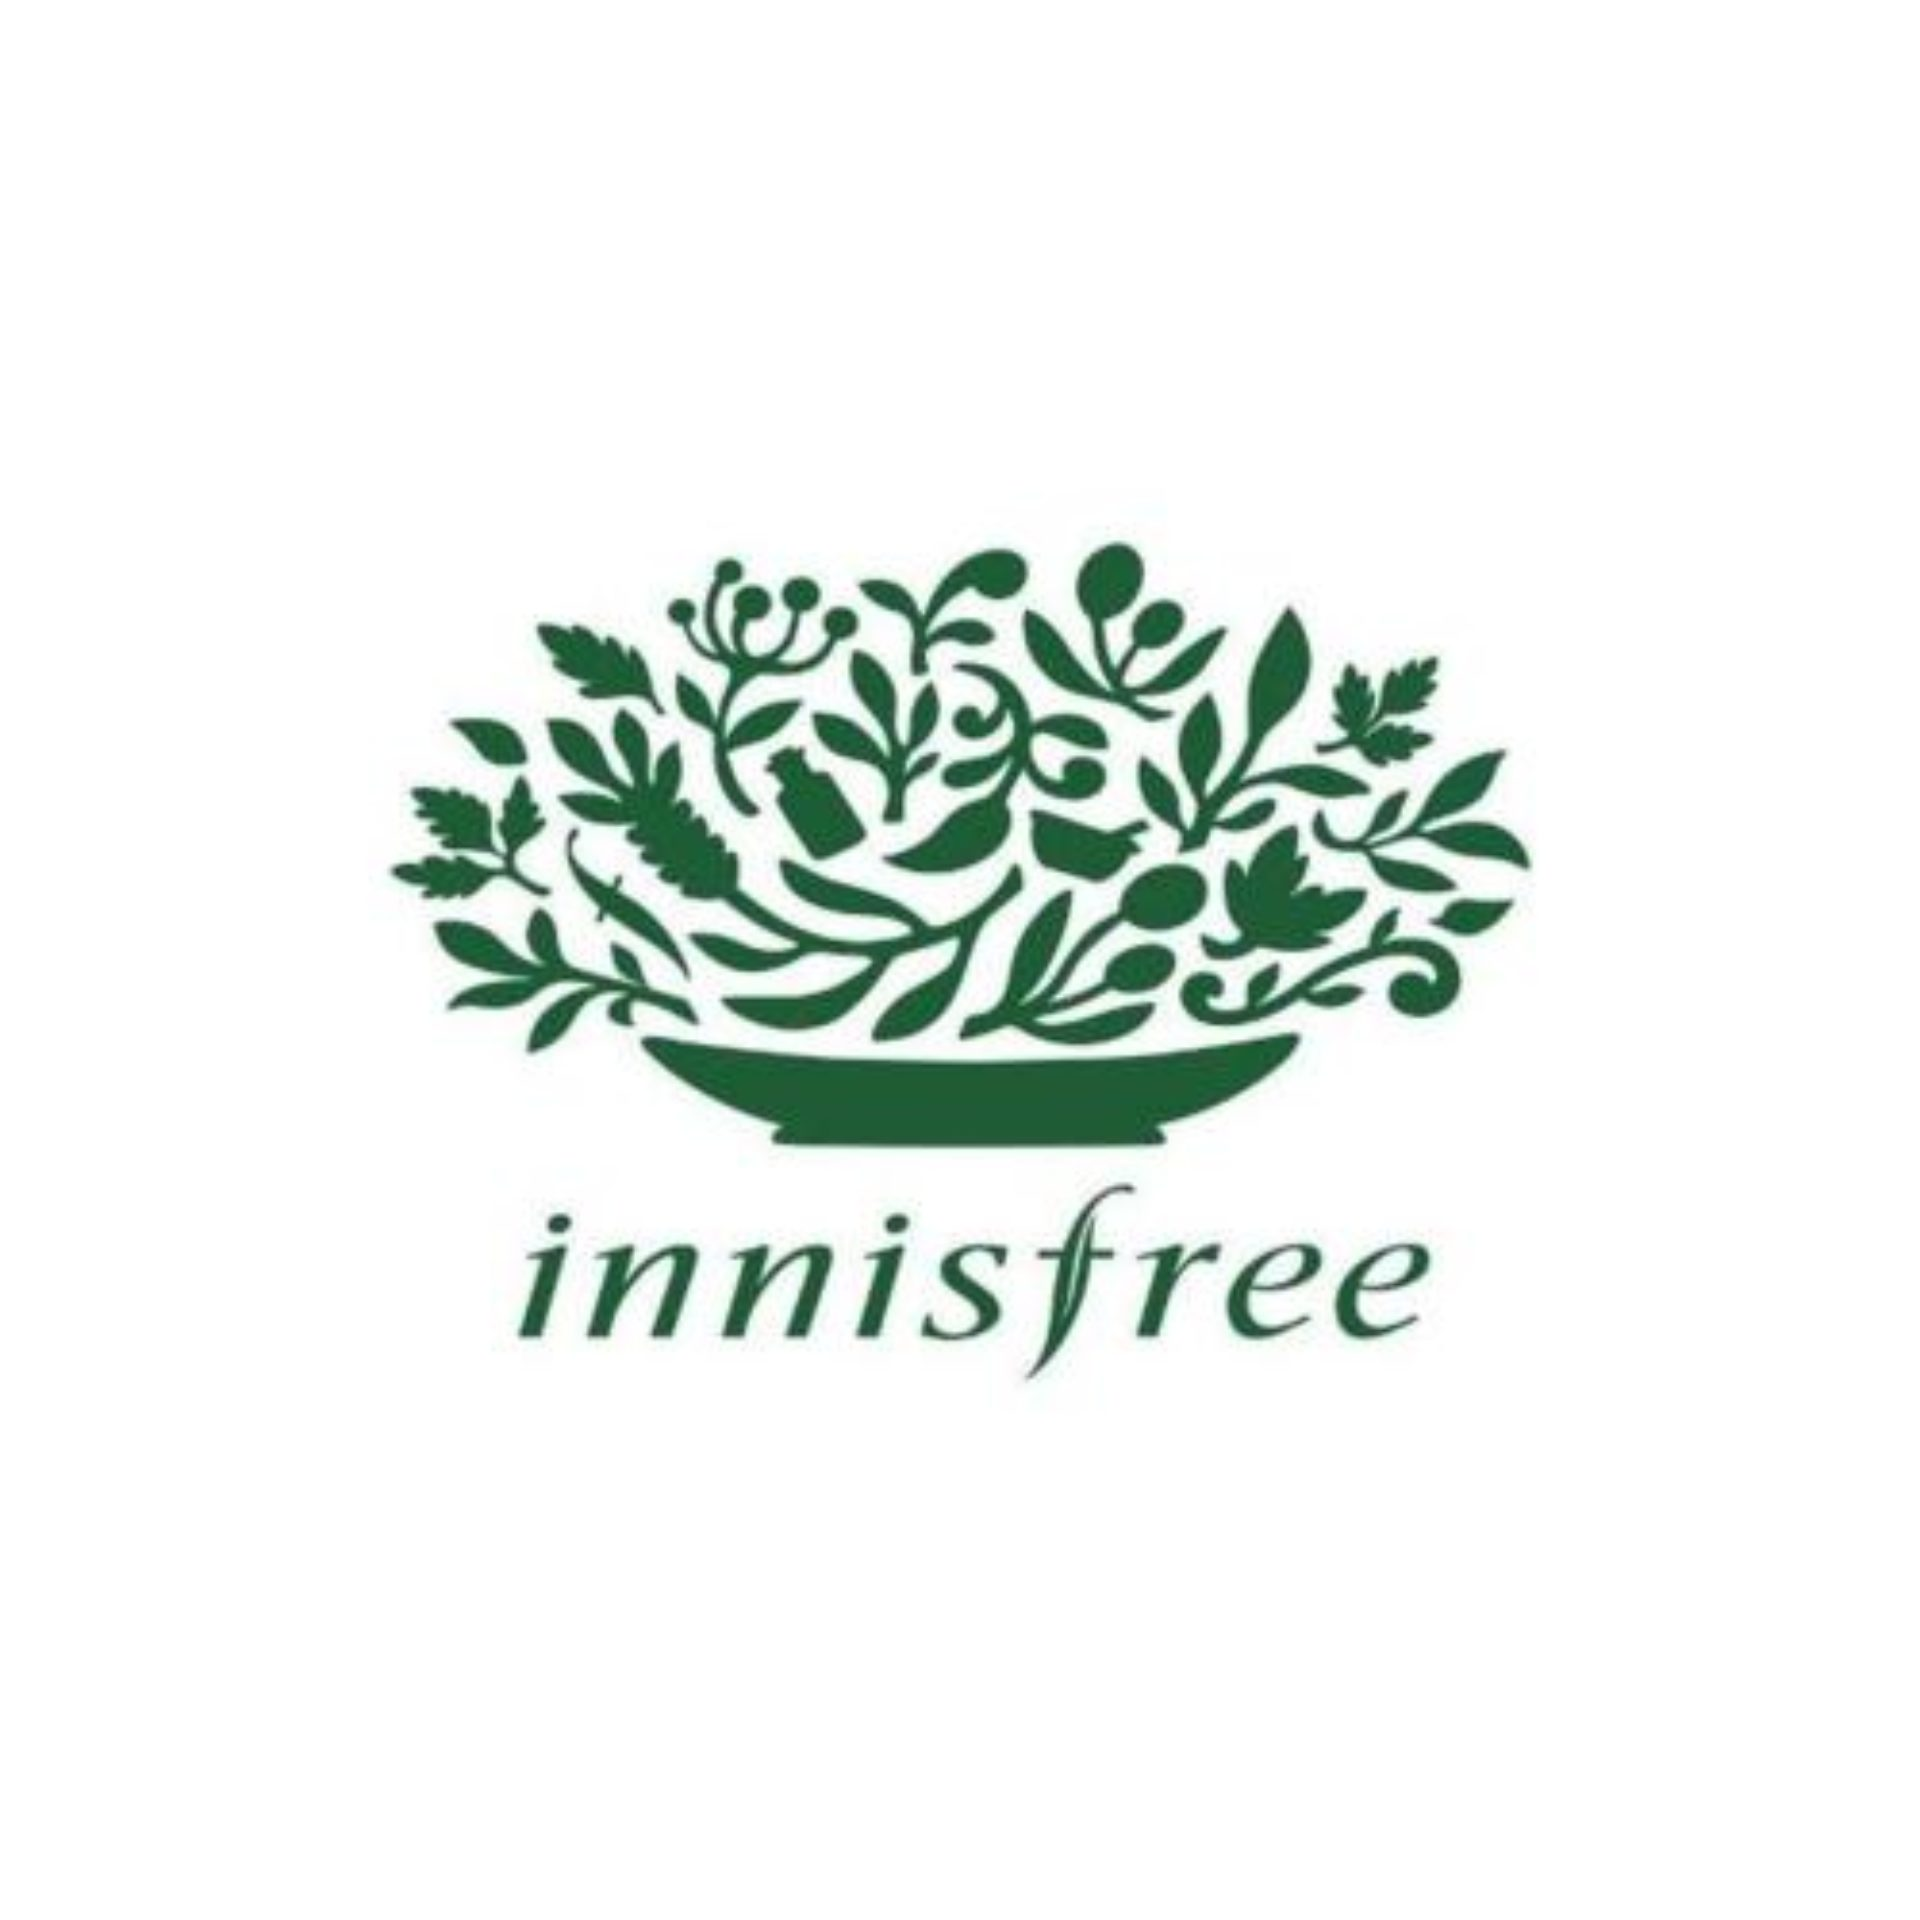 innisfree-1